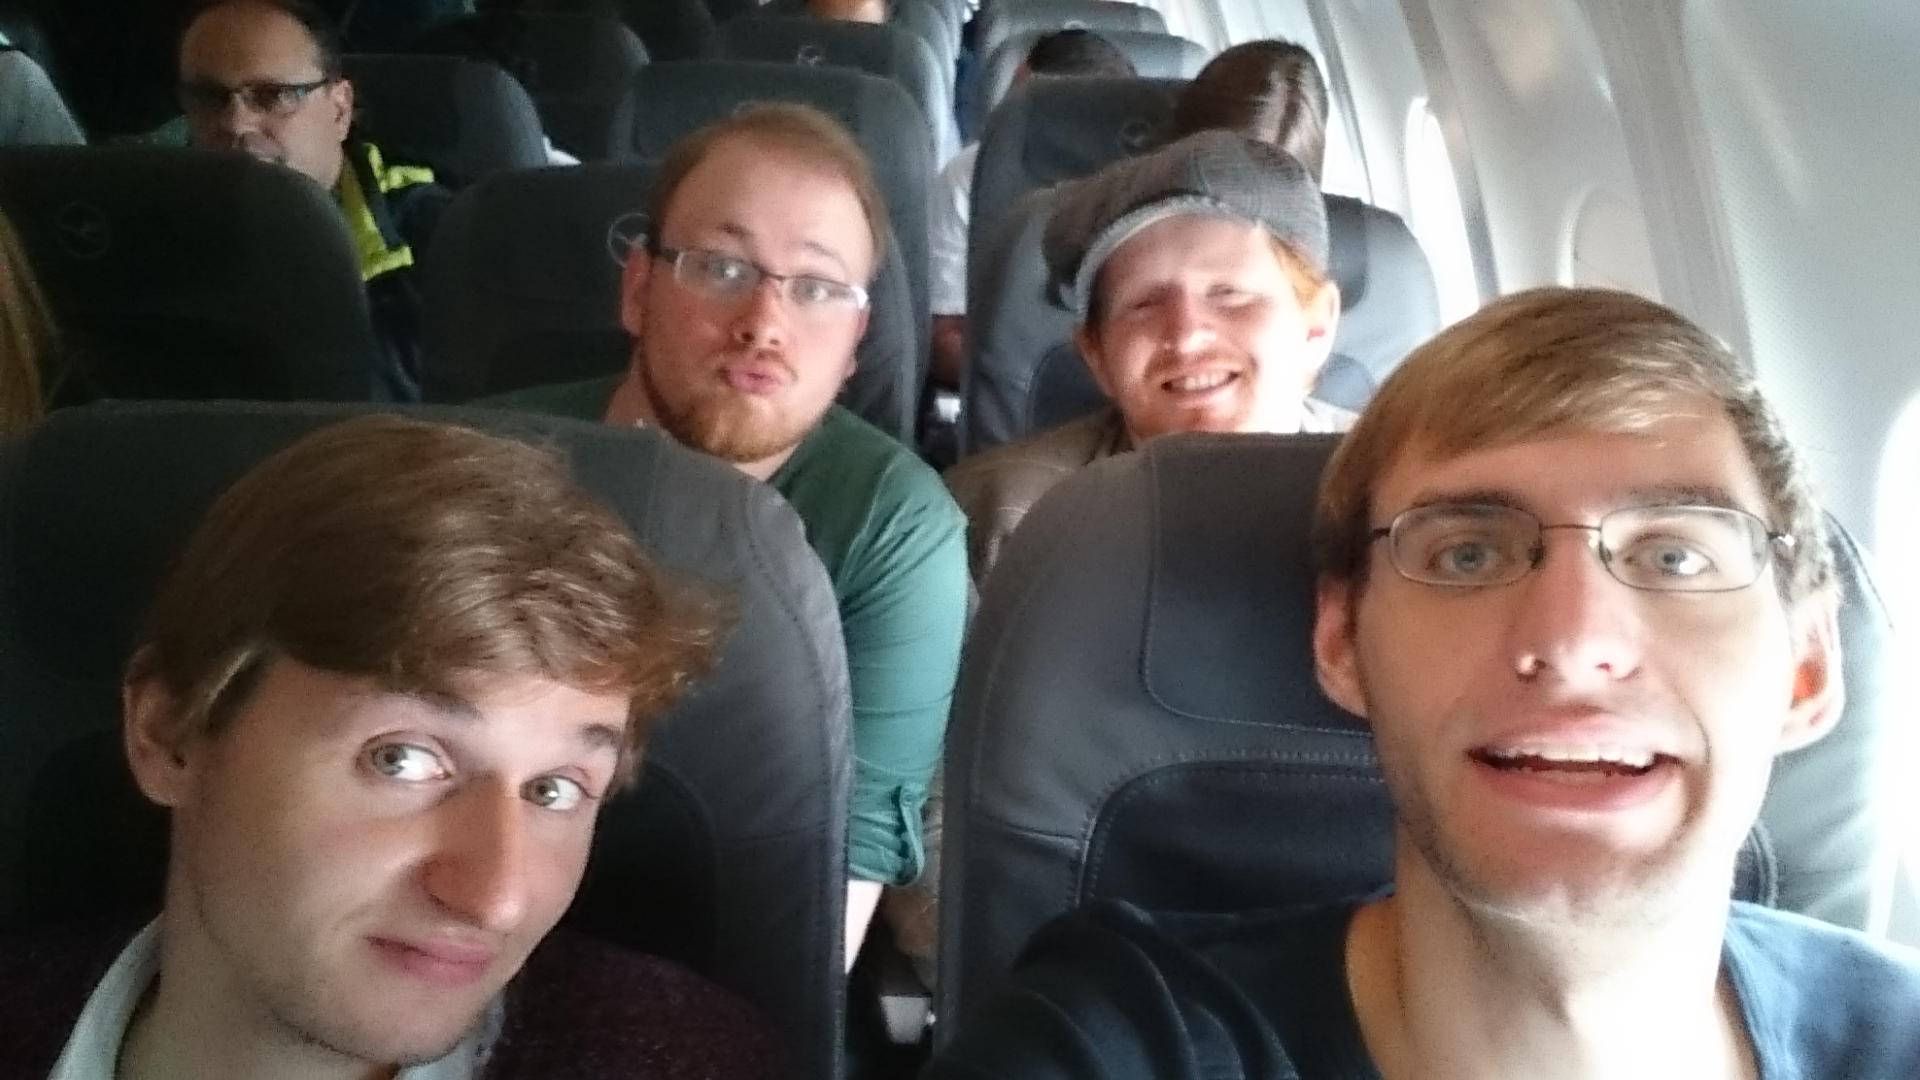 Flight back to Germany